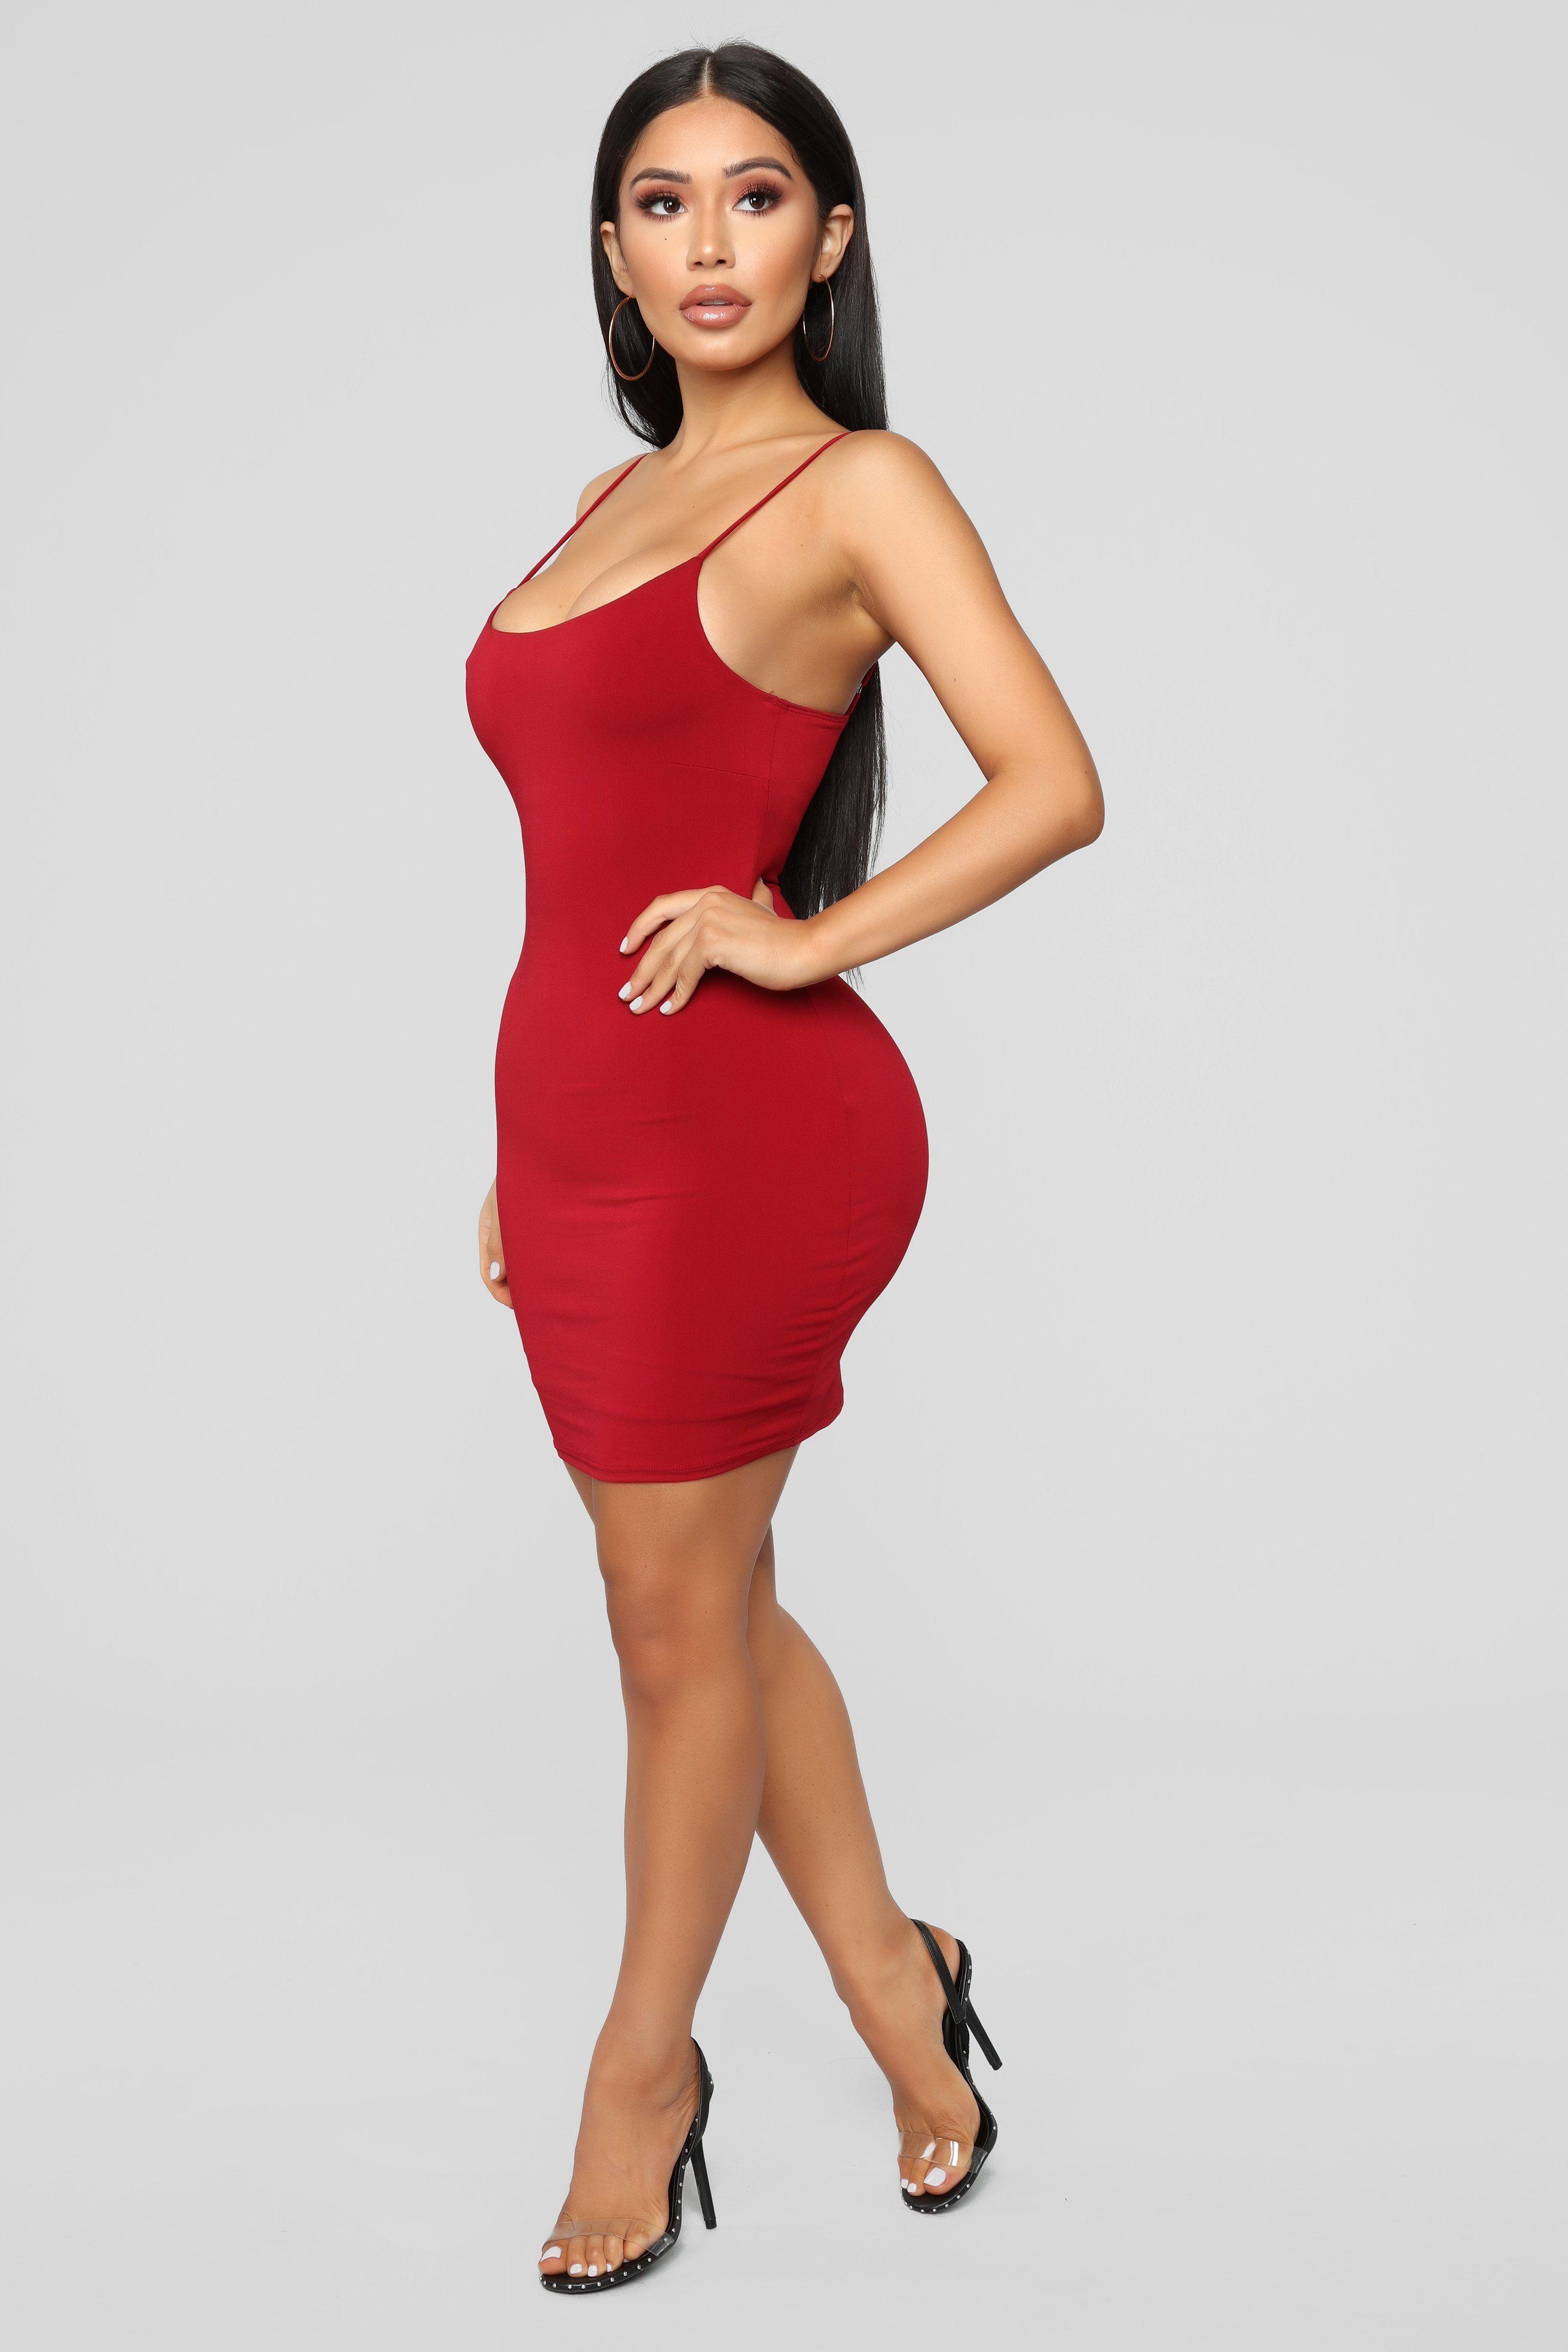 Womens Vegas Go To Mini Dress In Burgundy Size X Large By Fashion Nova In 2021 Fashion Mini Dress Fall Fashion Outfits [ 3936 x 2624 Pixel ]